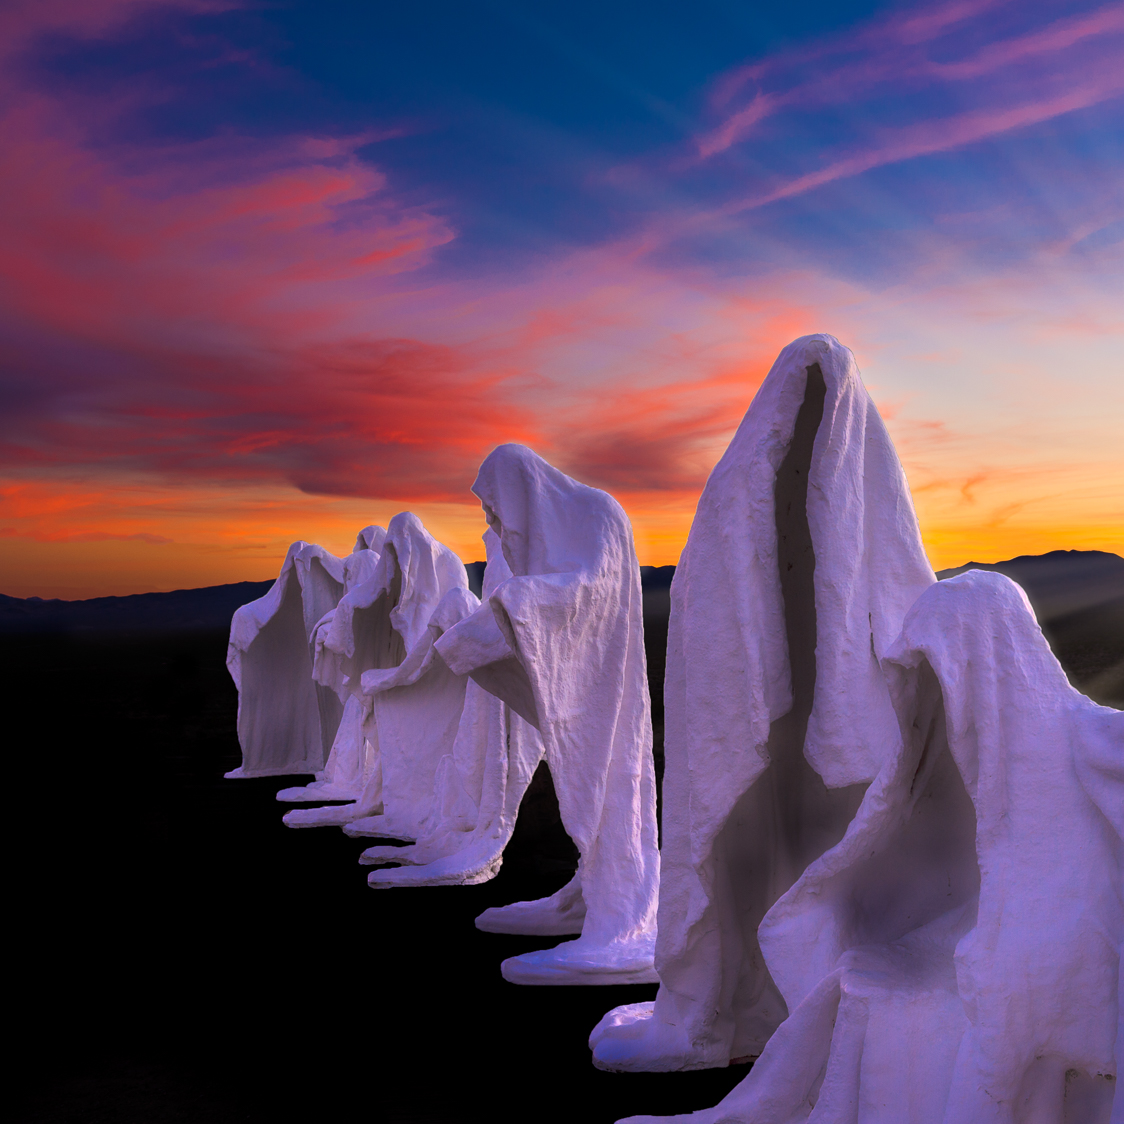 Garret Winslow- bywinslow.com Ghostly Sunset20160212-_G4W1666-Ghostly-Sunset-16.25x16.25-final-metal-2Ghostly-Sunset-1